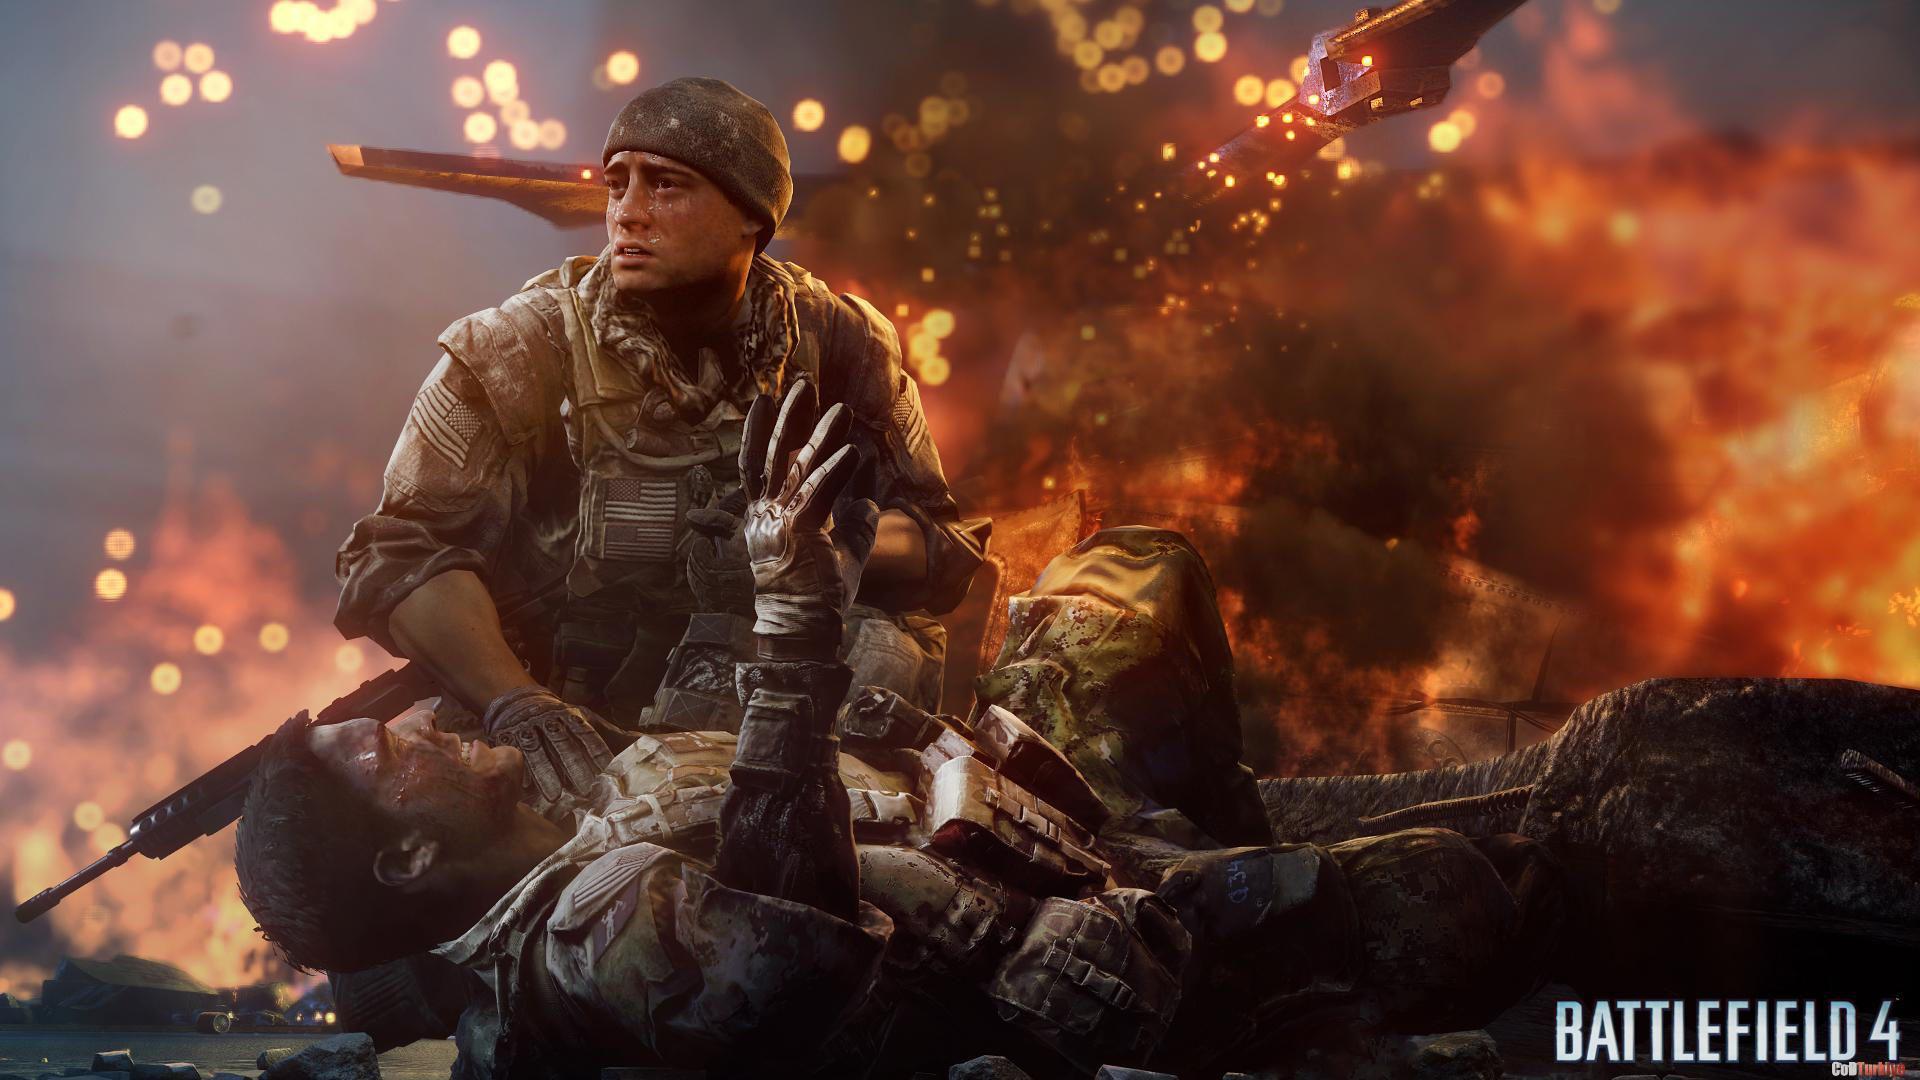 Battlefield 4 Wallpapers Crashsite